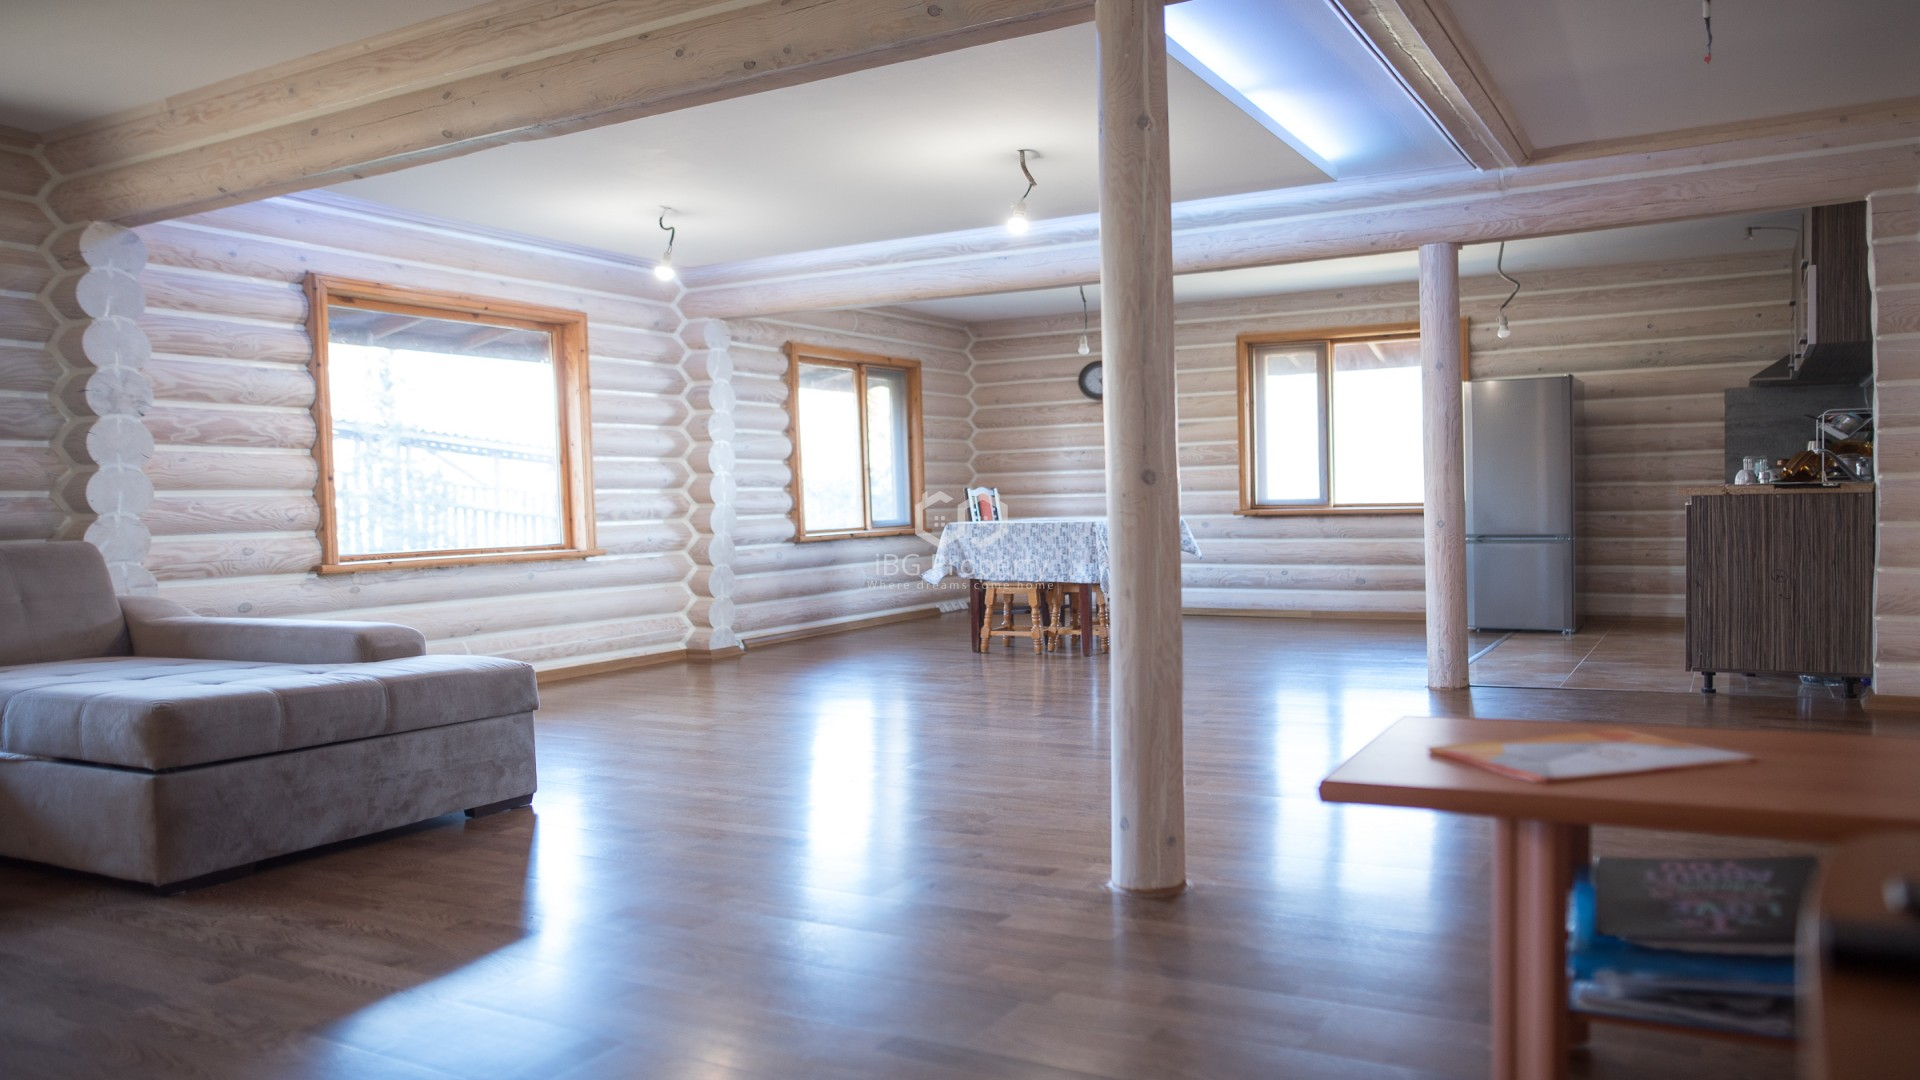 ECO villa on the Black sea coast 302 m2